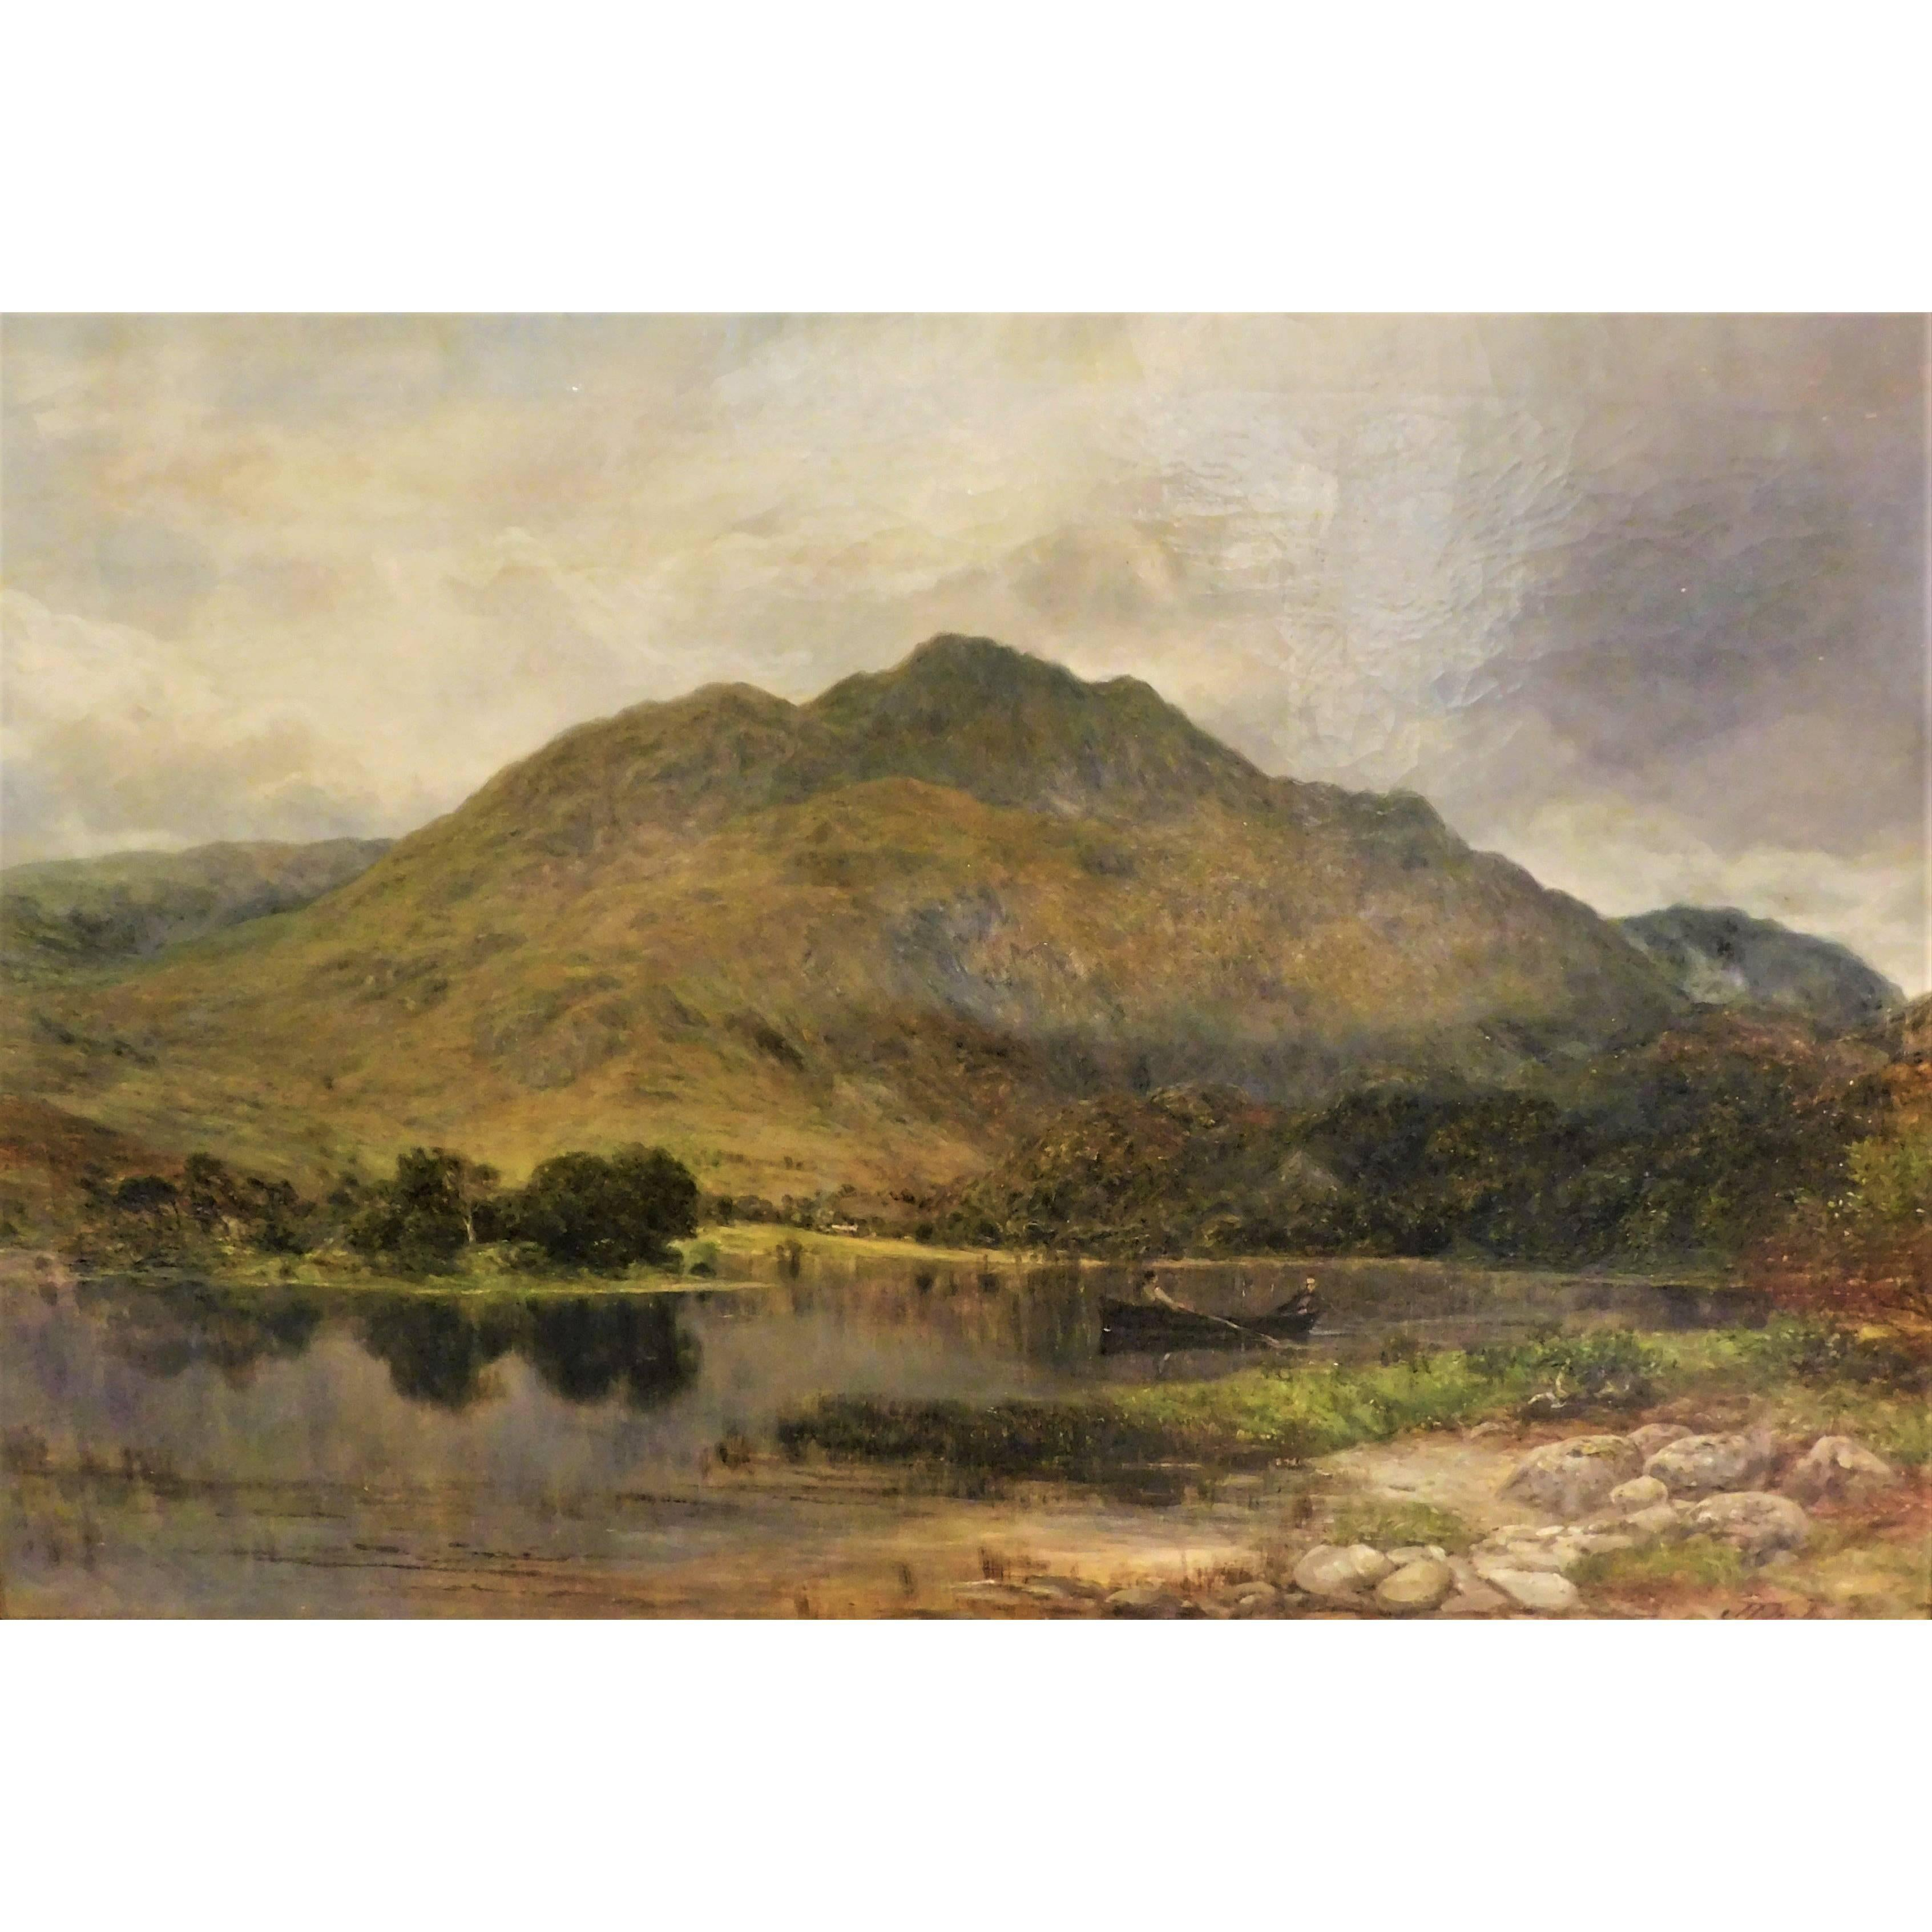 James Docharty Original Oil on Canvas 1874 Landscape Painting